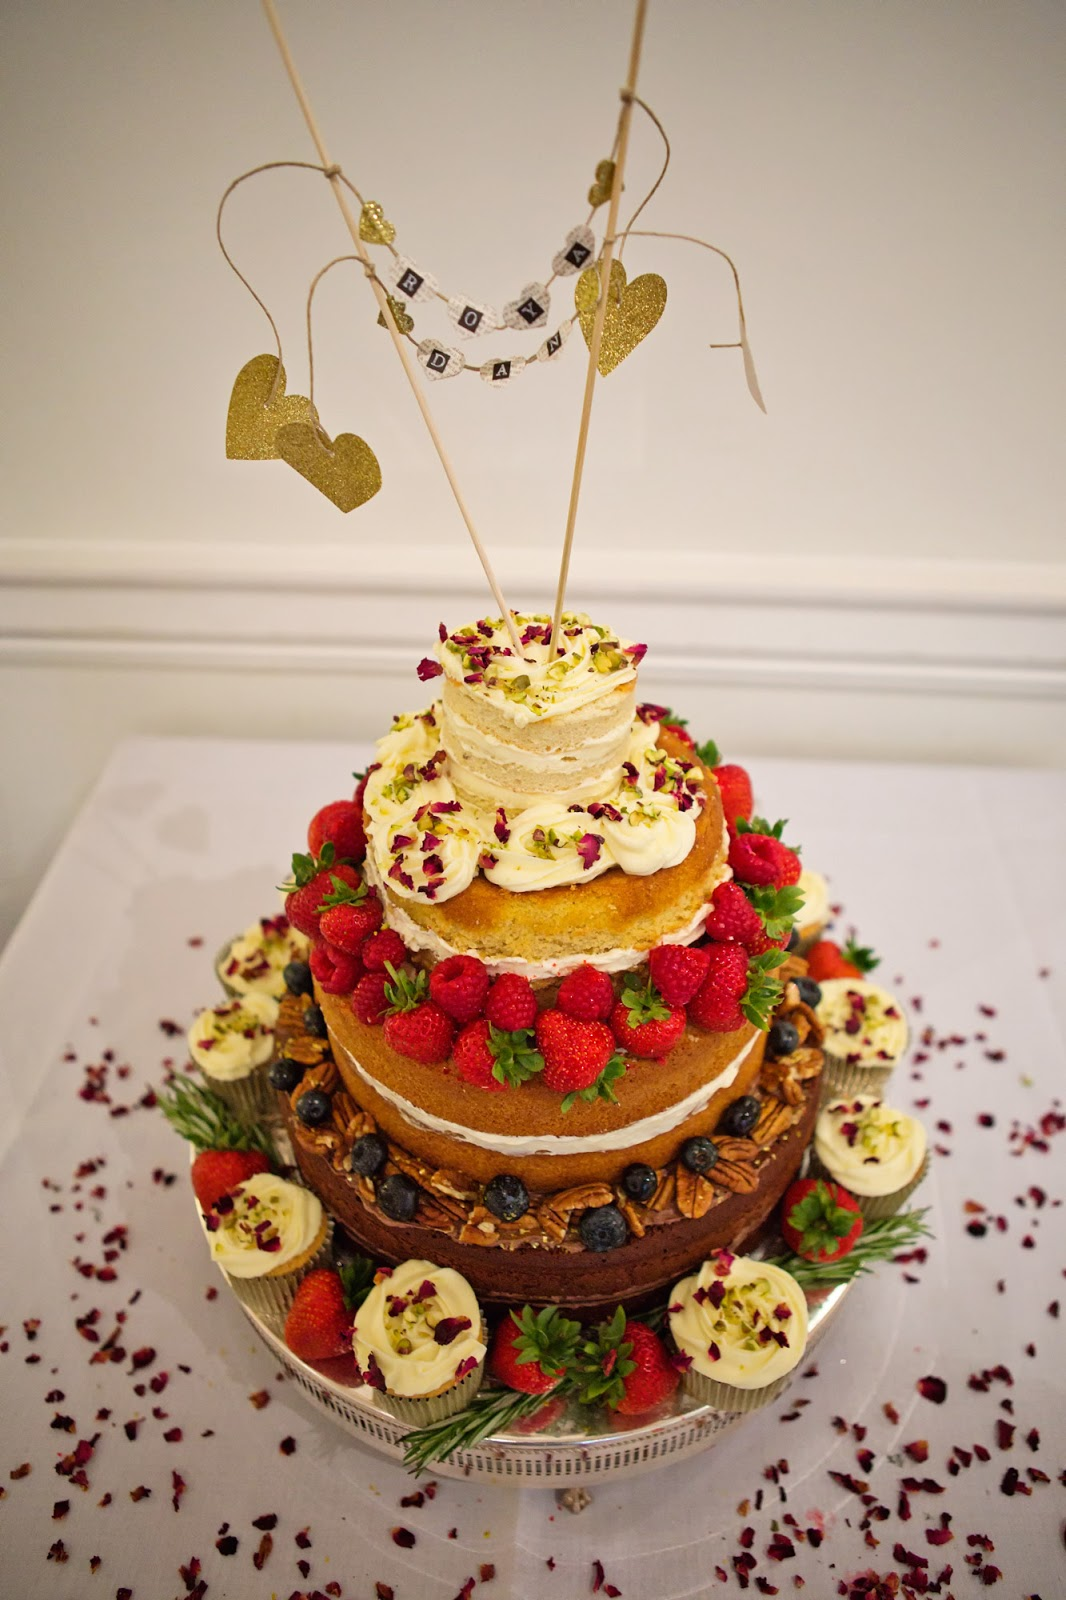 Rustic raffia wedding cake by Bake My Day | Baking classes